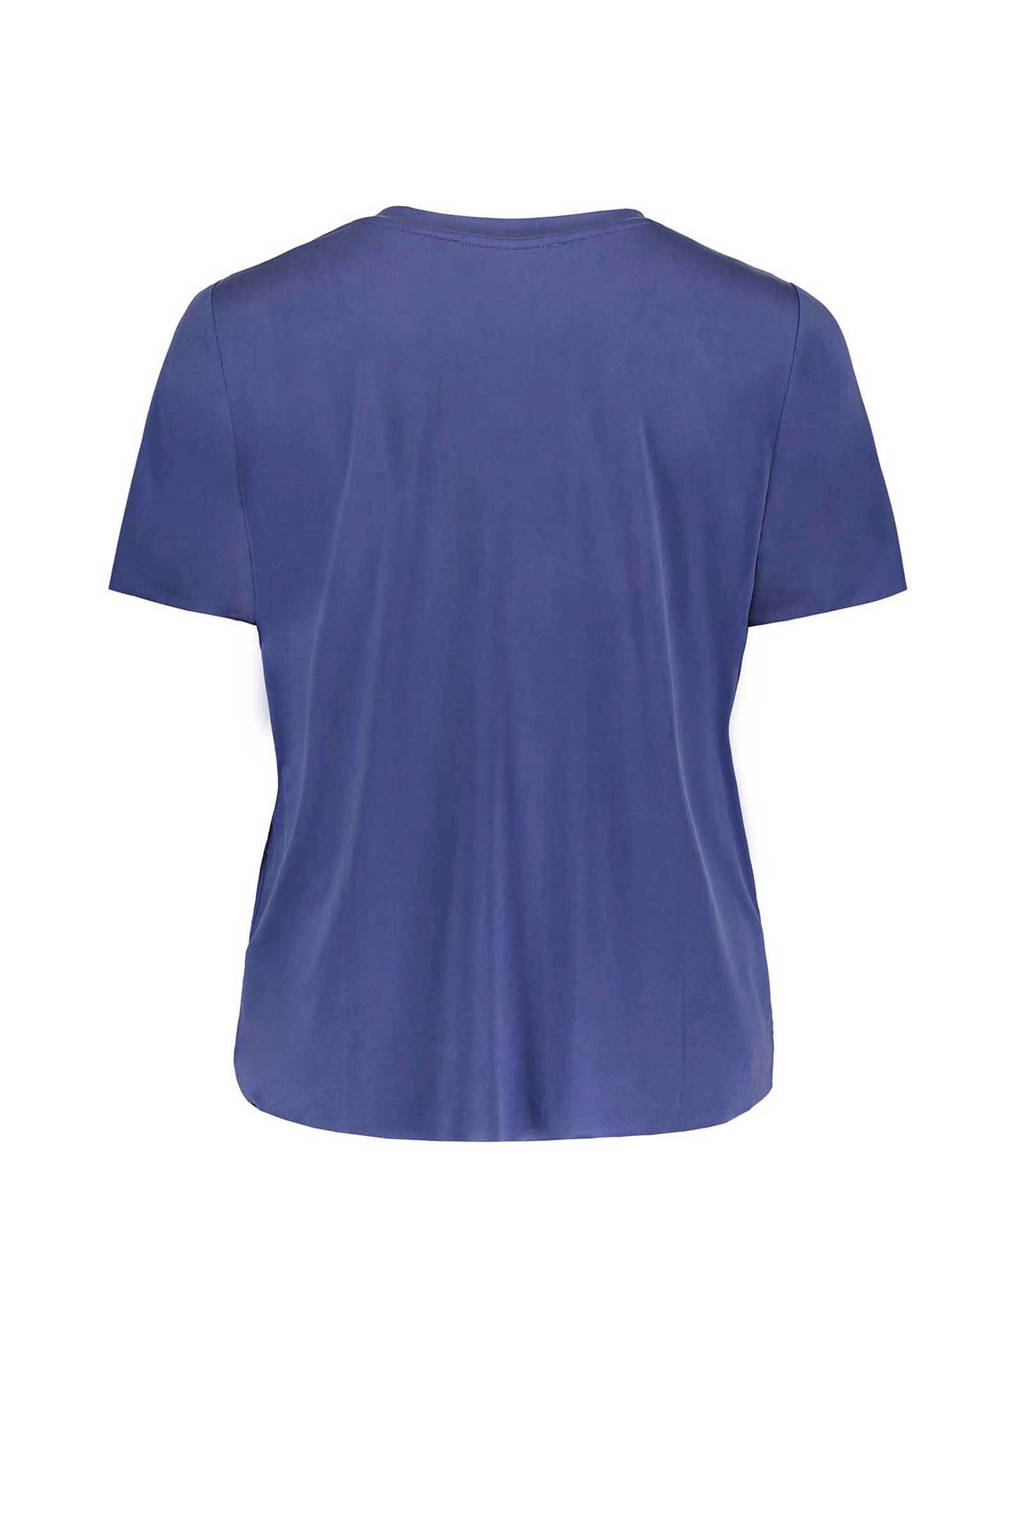 Sissy-Boy T-shirt, lavendel blauw